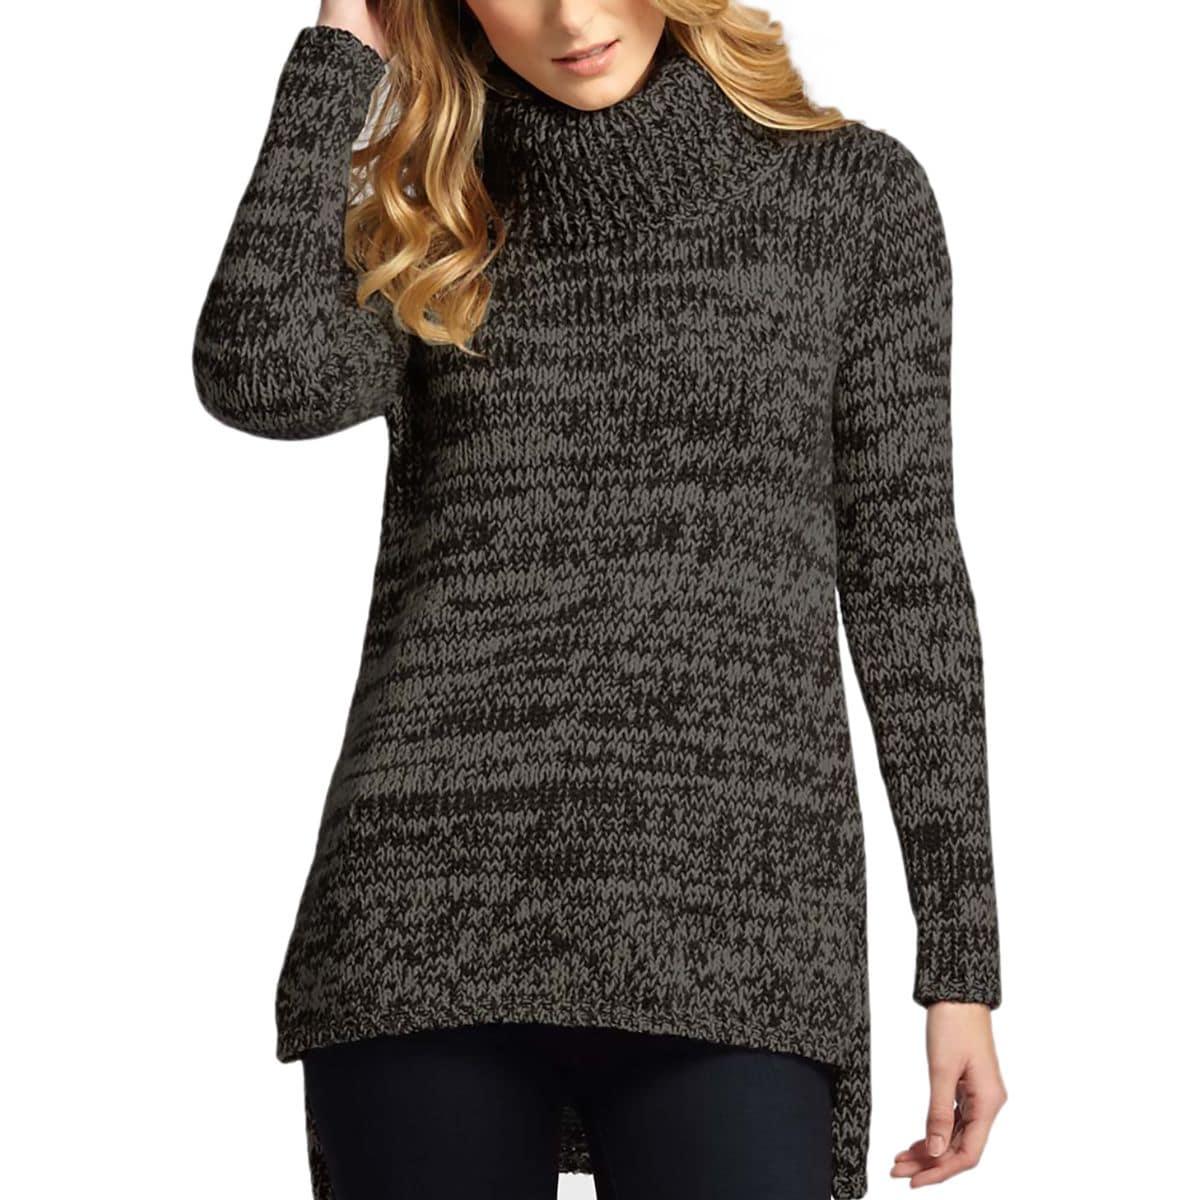 Indigenous Designs Cozy Melange Tunic Sweater - Women